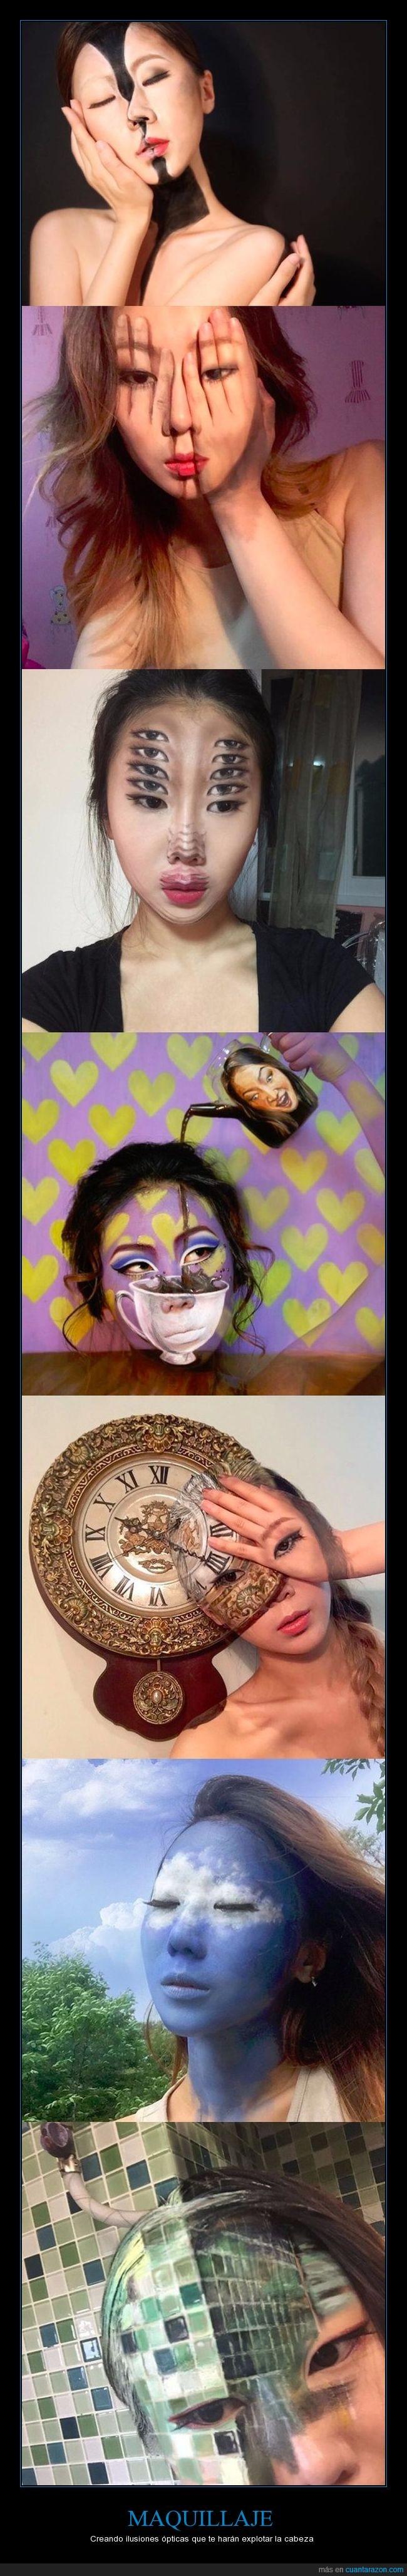 chica,maquillaje,pintura,transparente